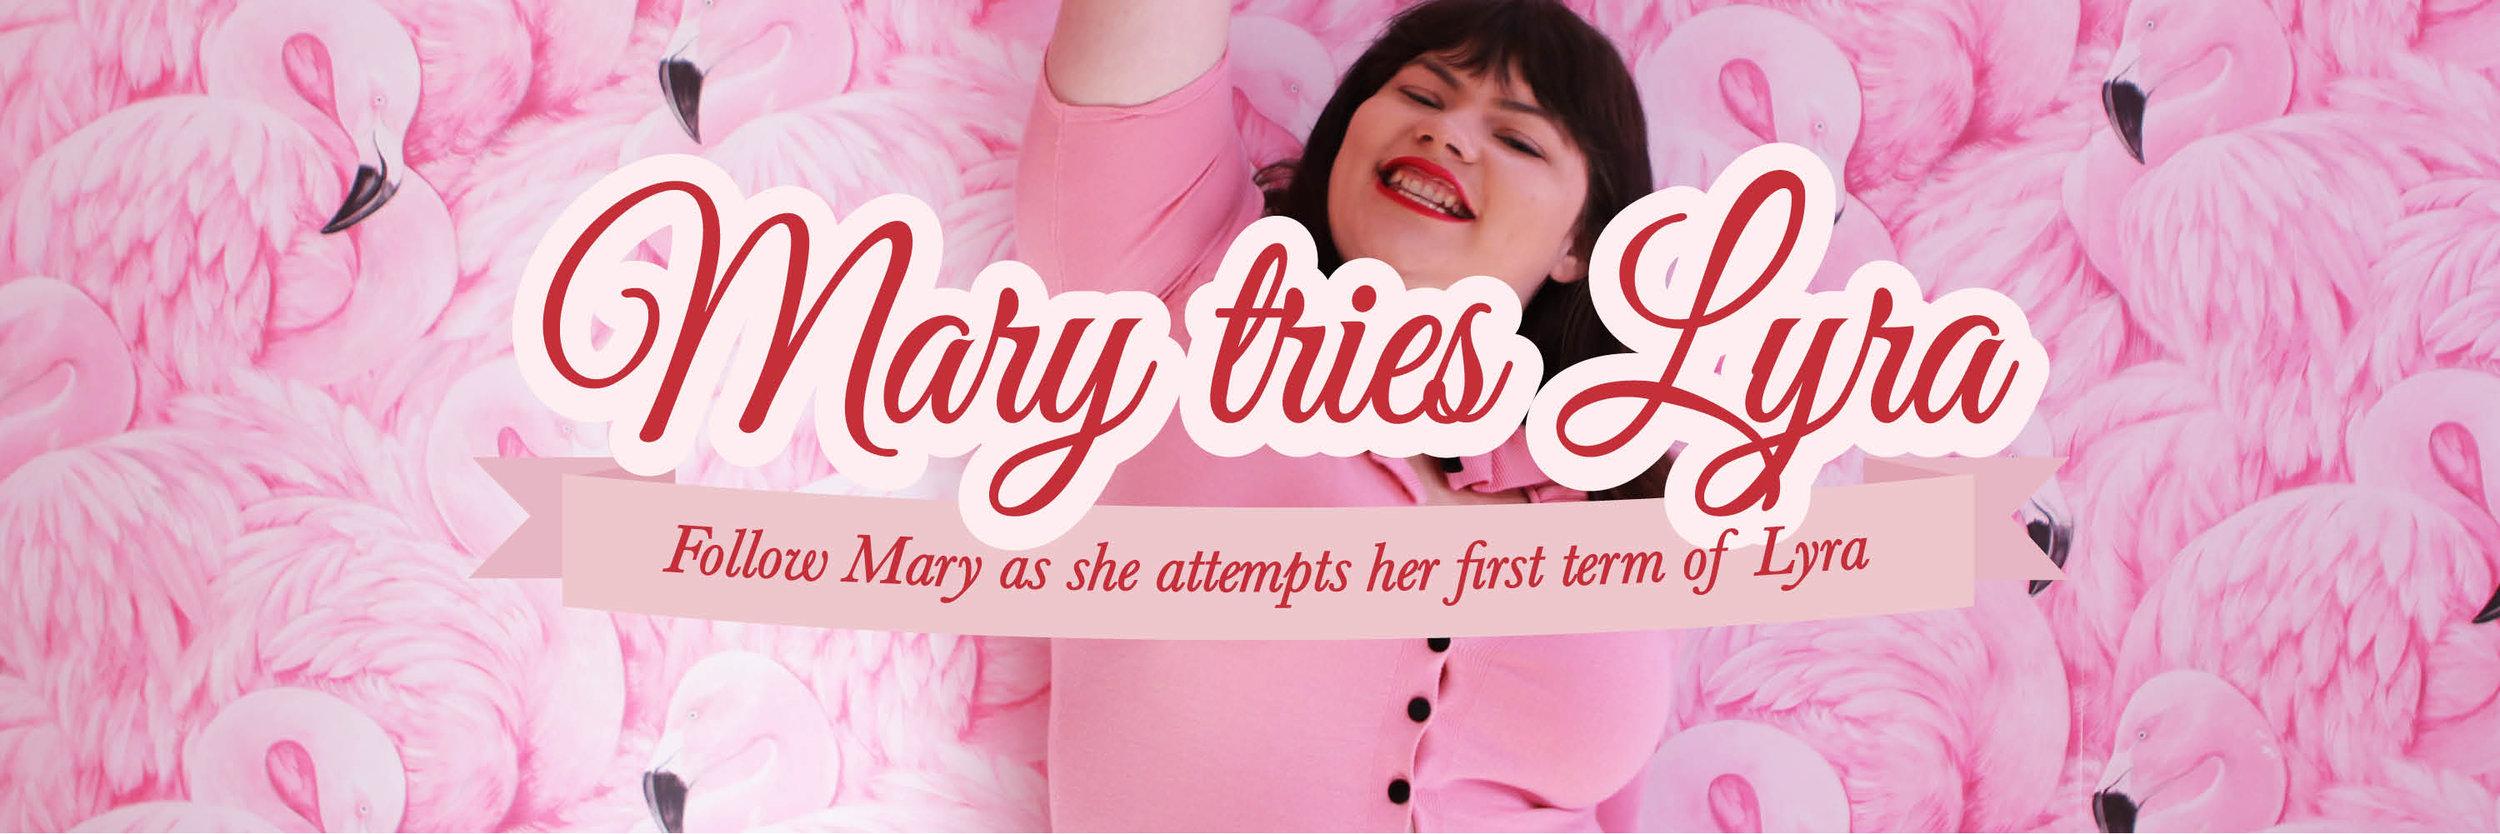 mary-tries-lyra-banner.jpg